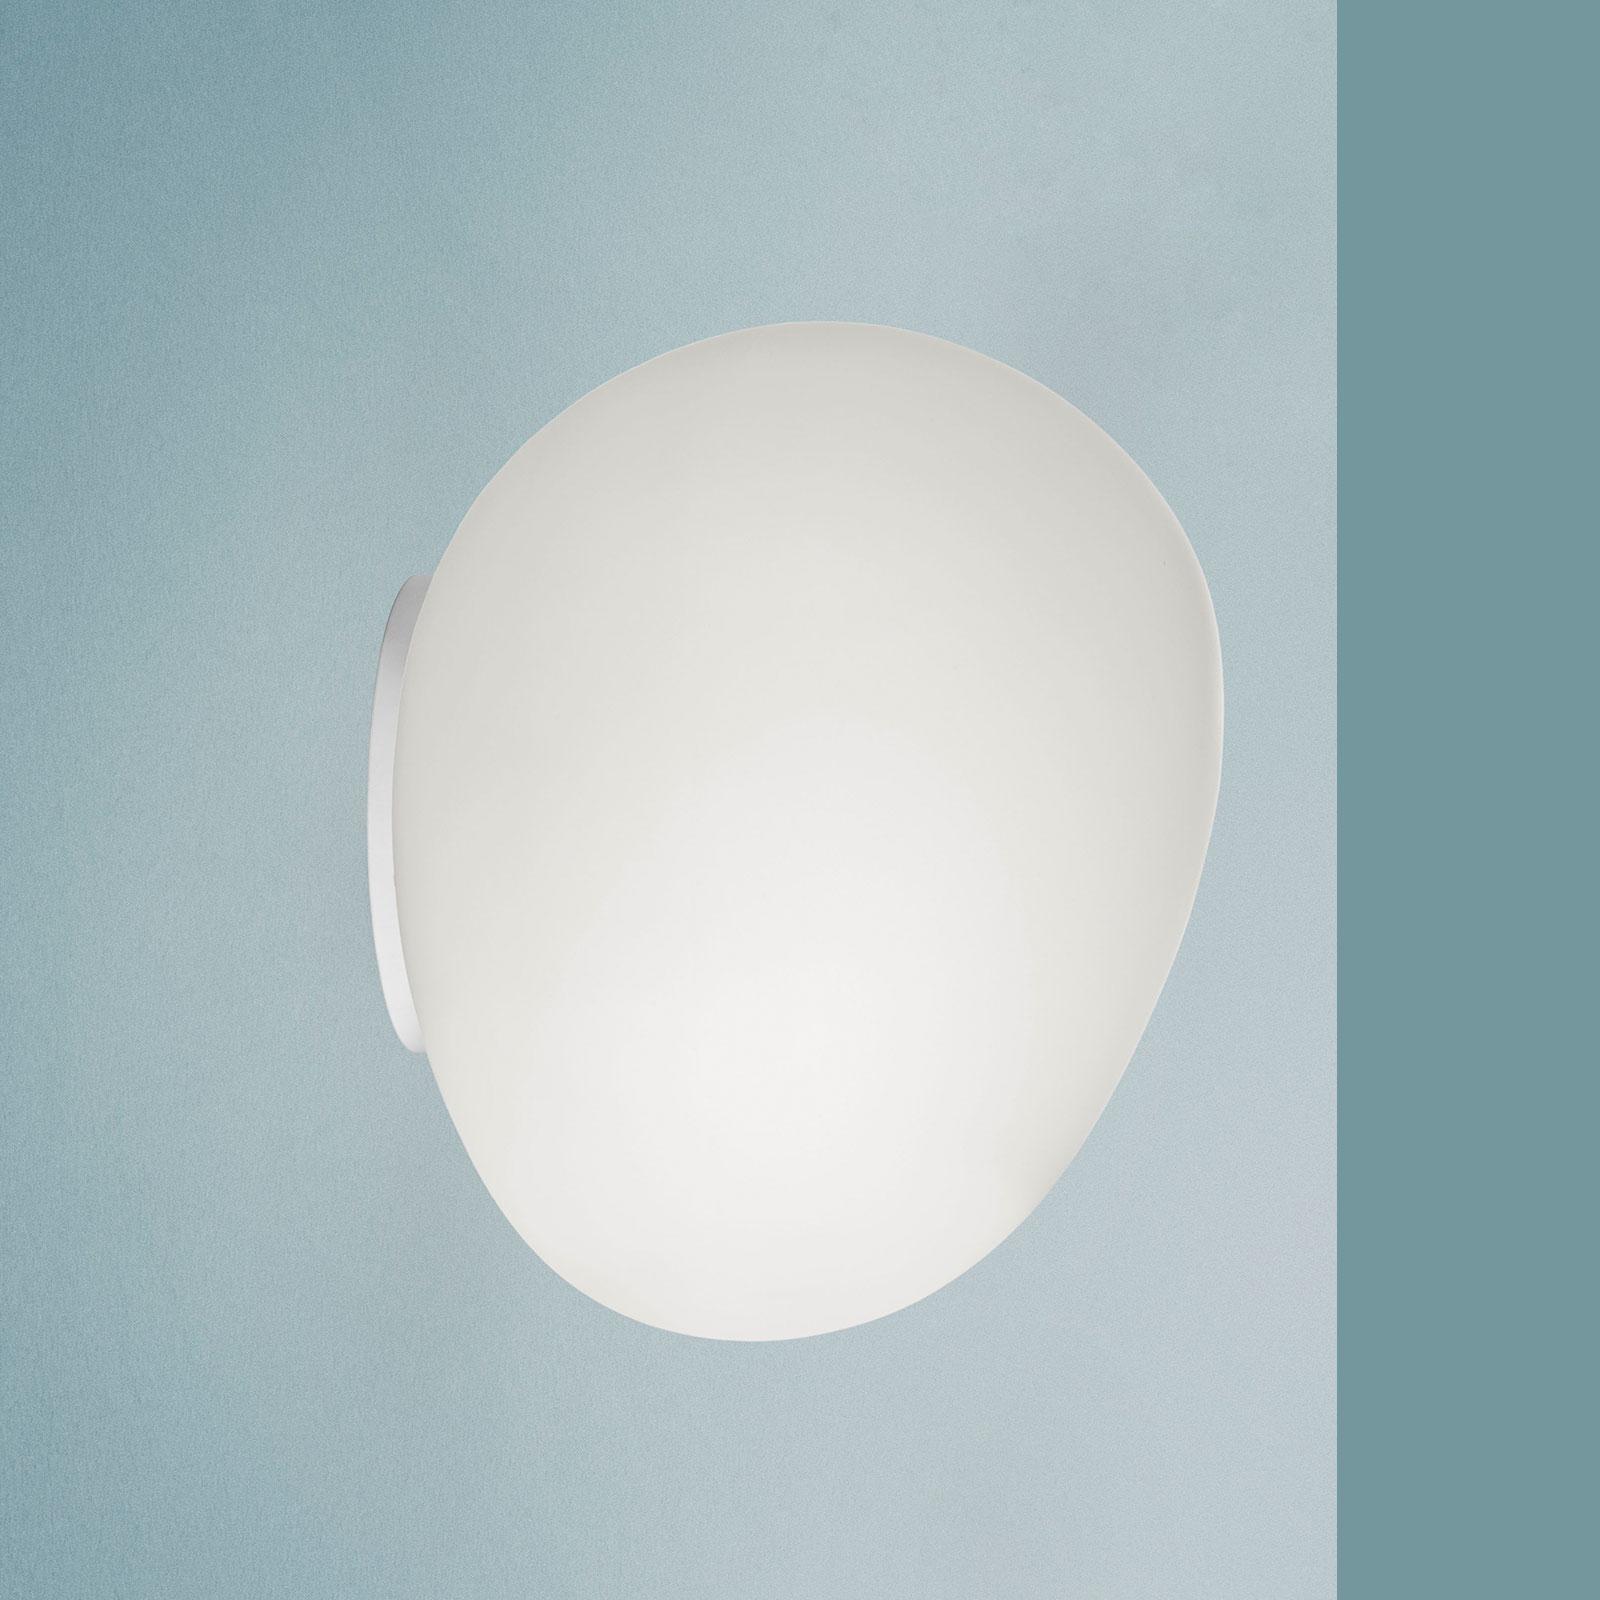 Foscarini Gregg MIDI udendørs LED-væglampe